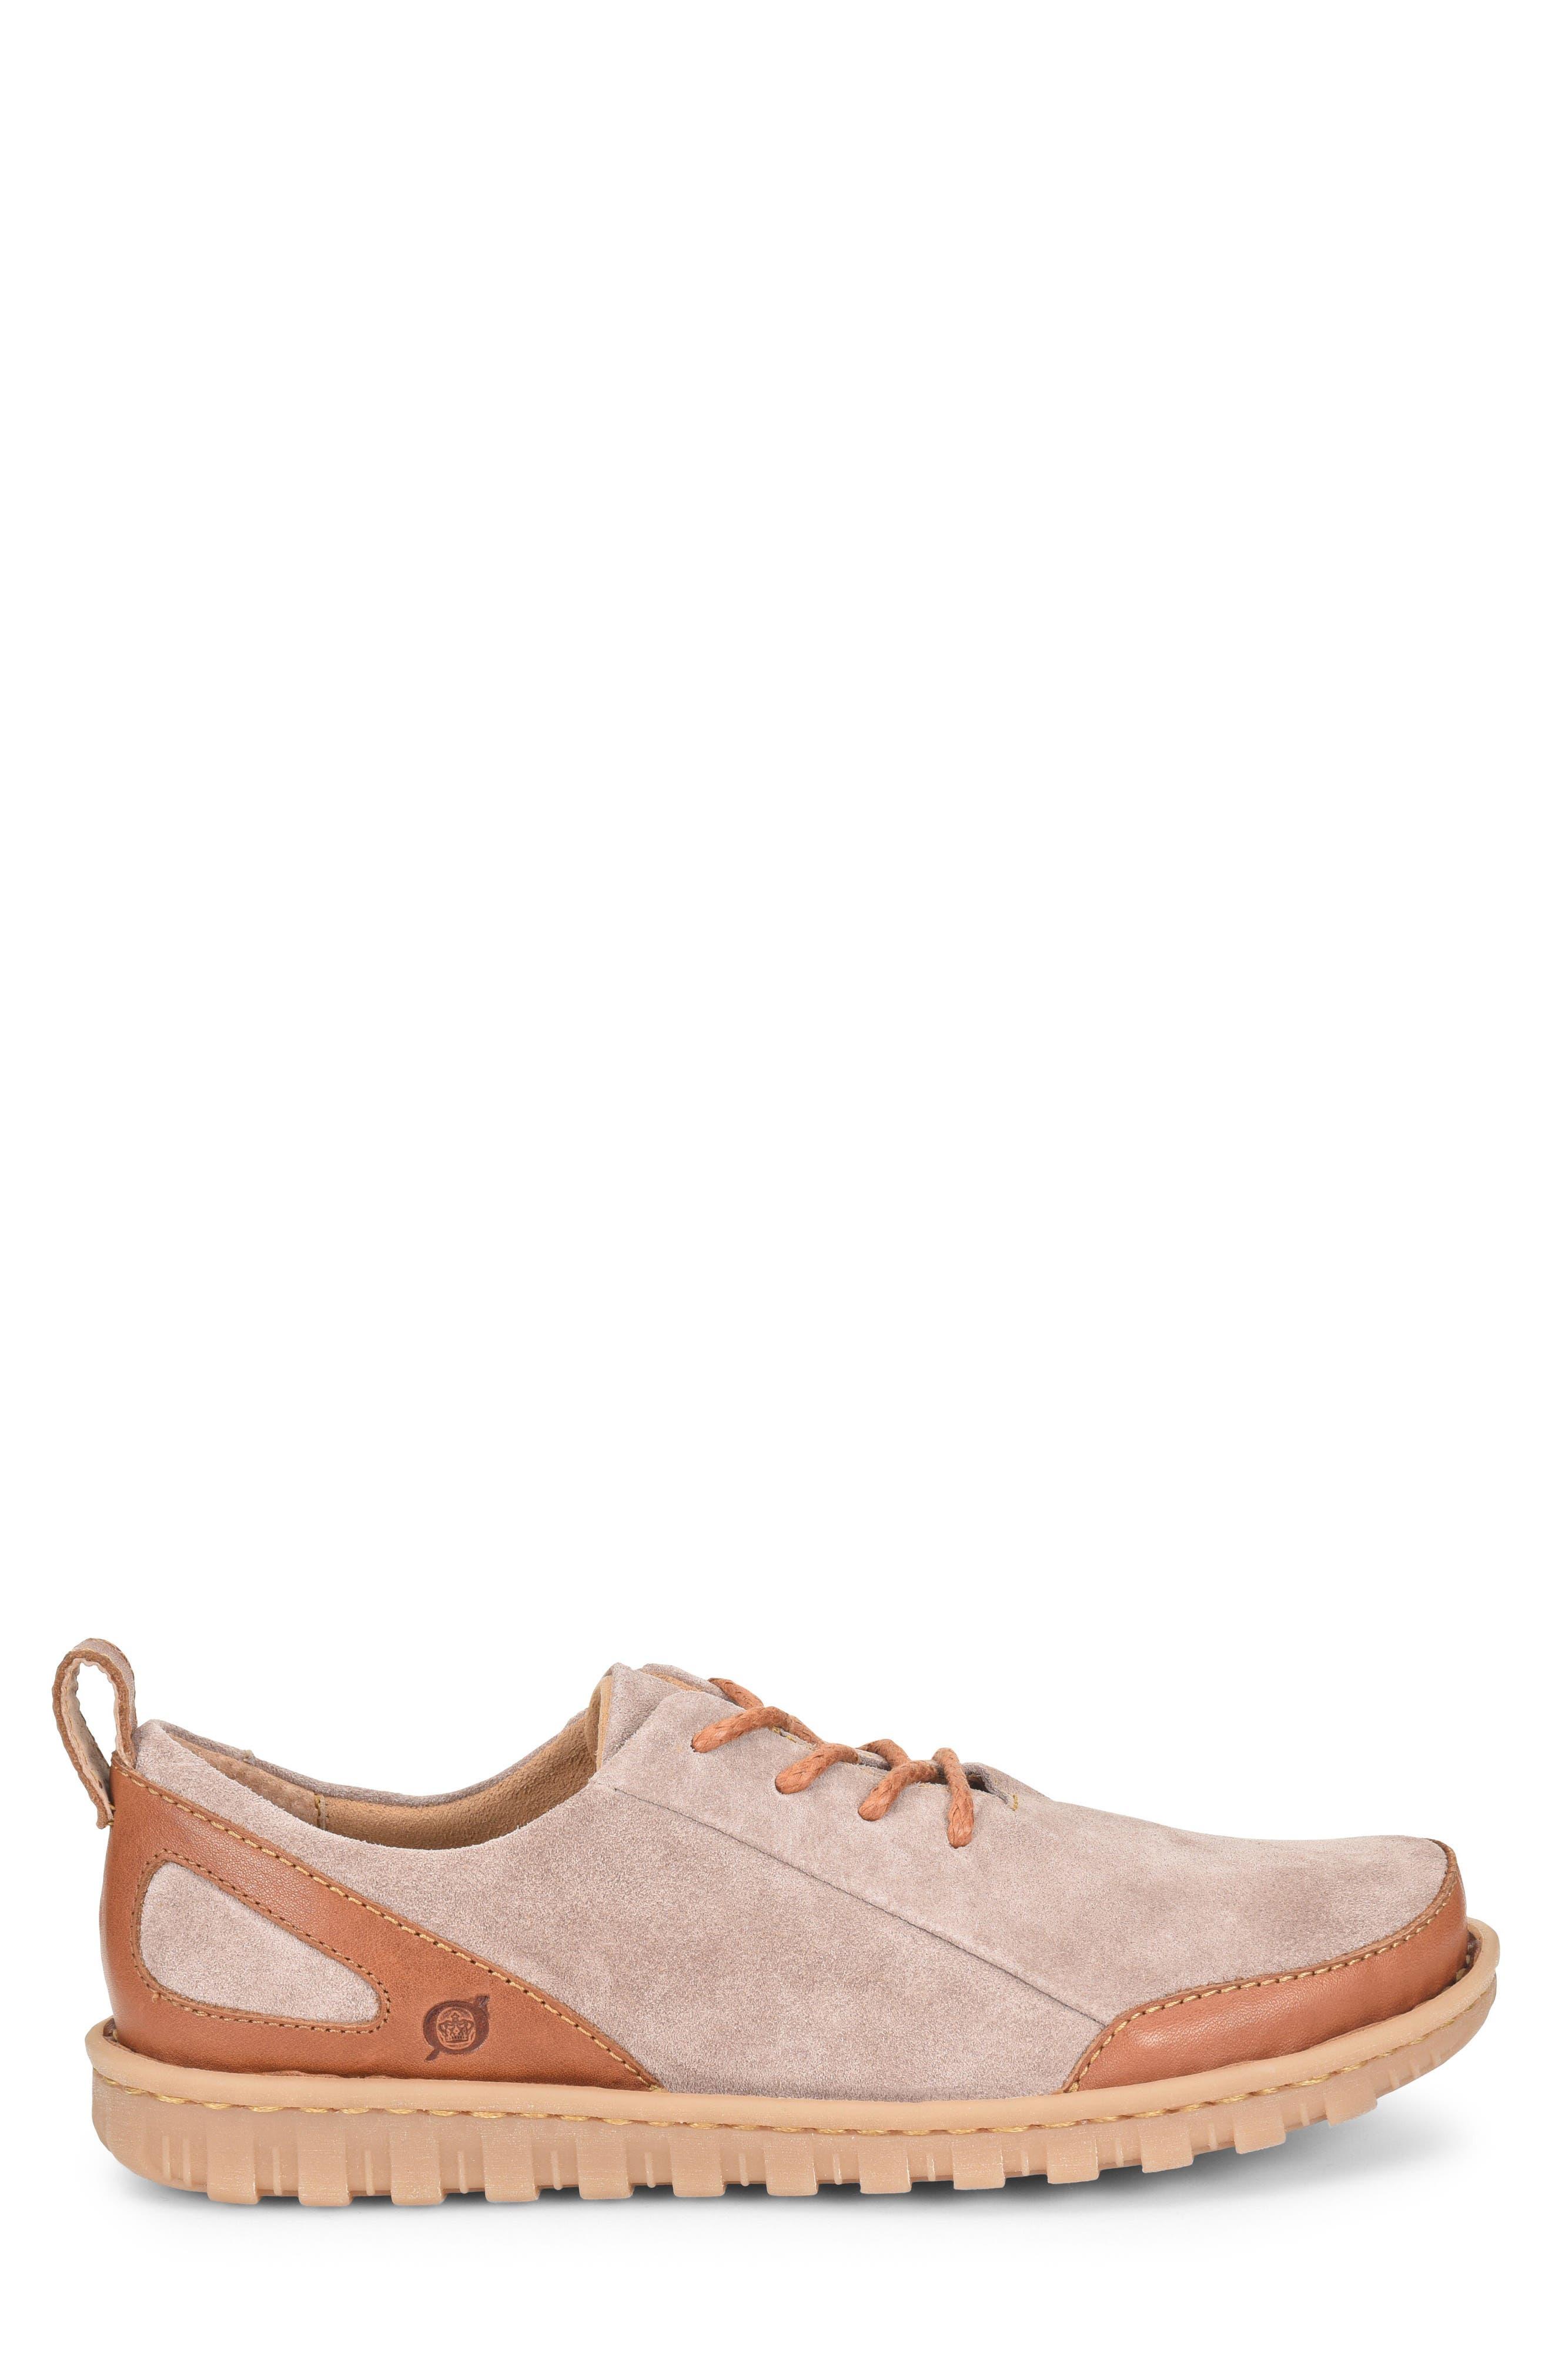 Piper Plain Toe Derby,                             Alternate thumbnail 3, color,                             Grey/ Bronze Leather